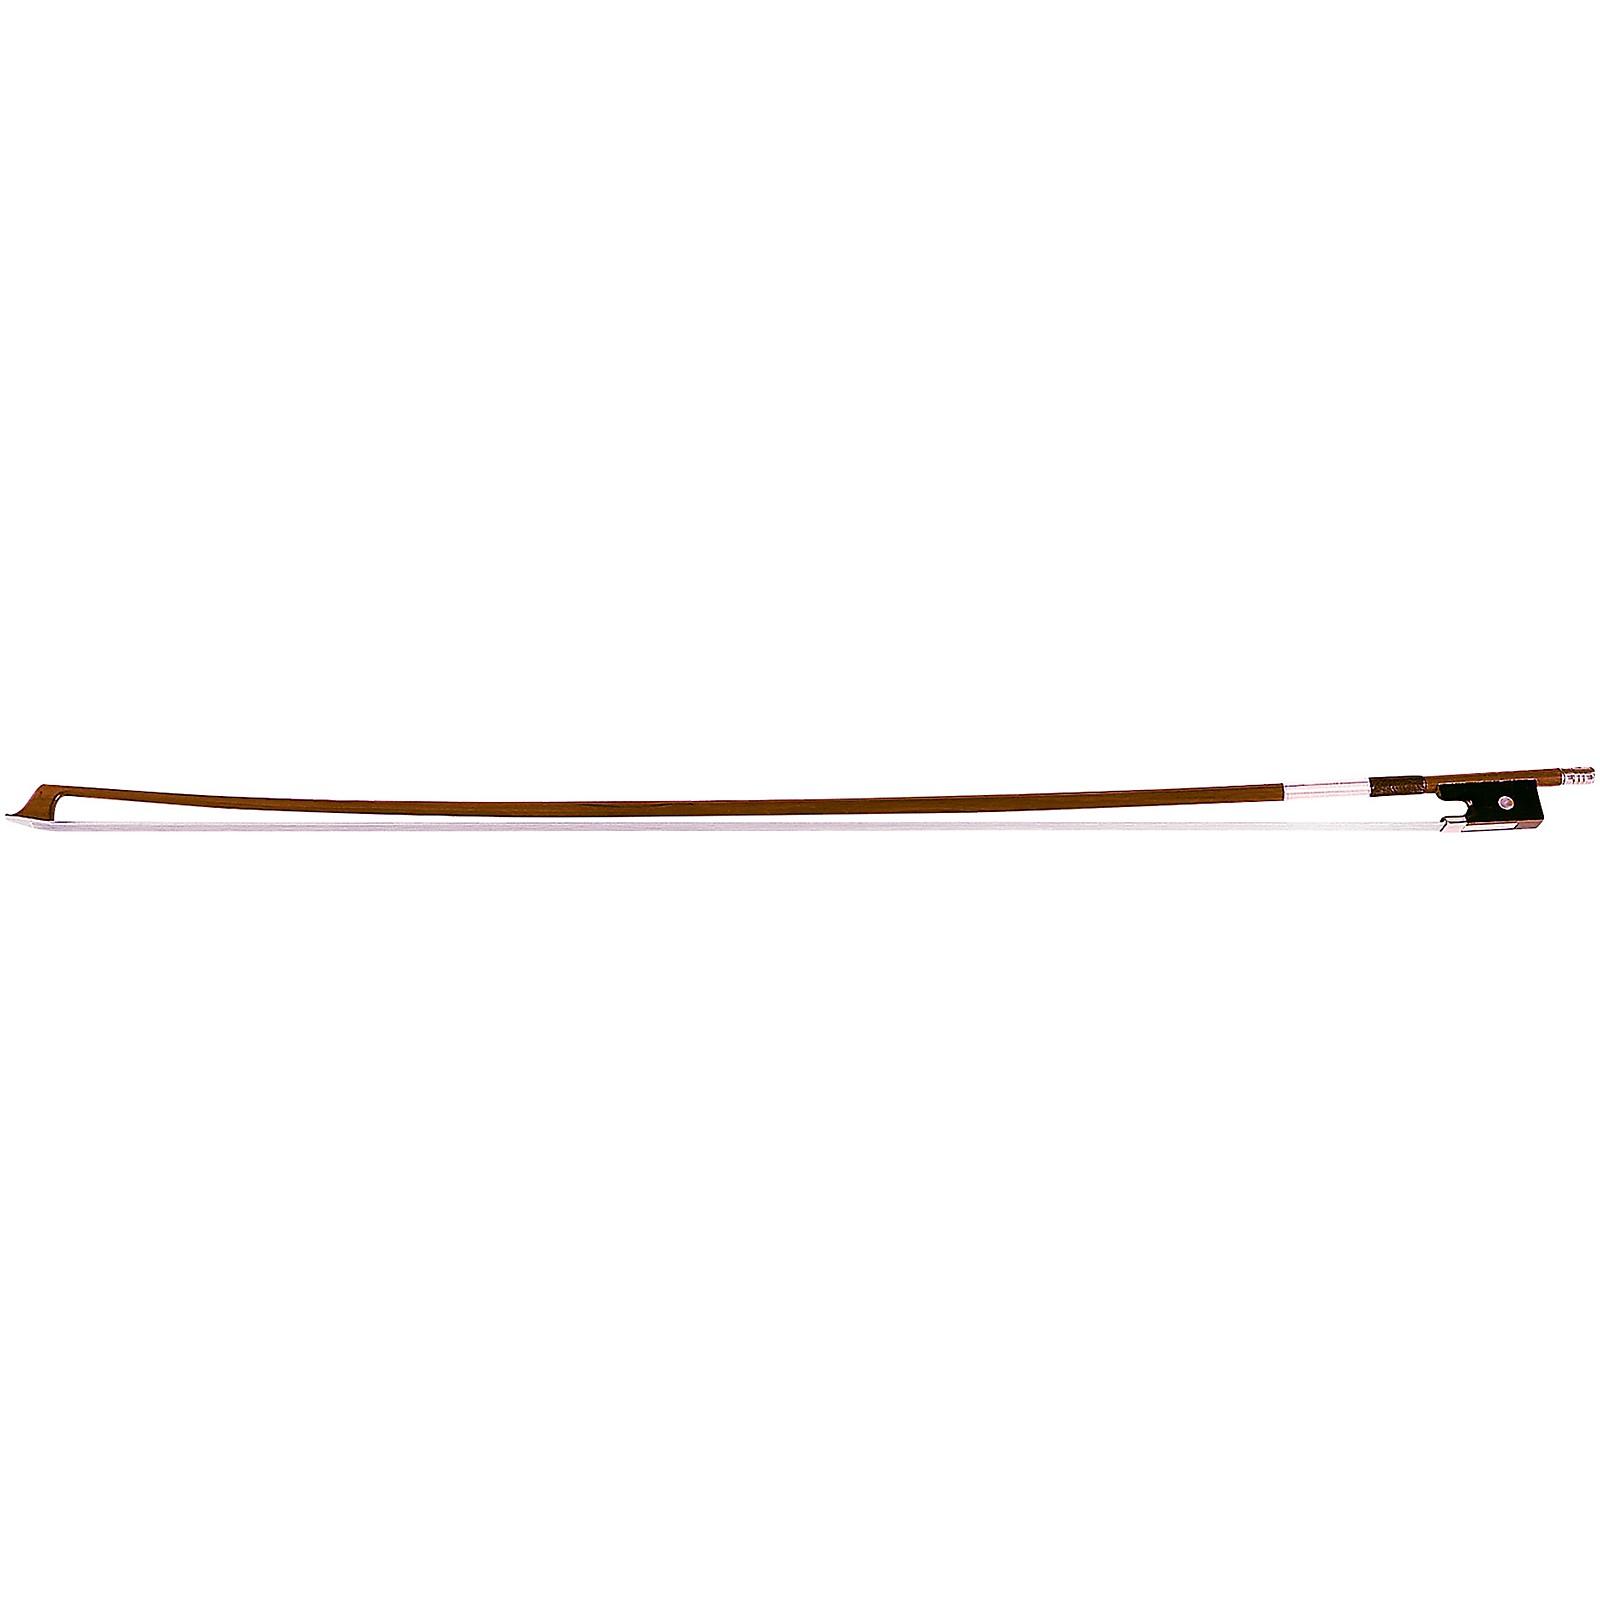 J. La Salle LB-40 Brazilwood Premium Student Violin Bow